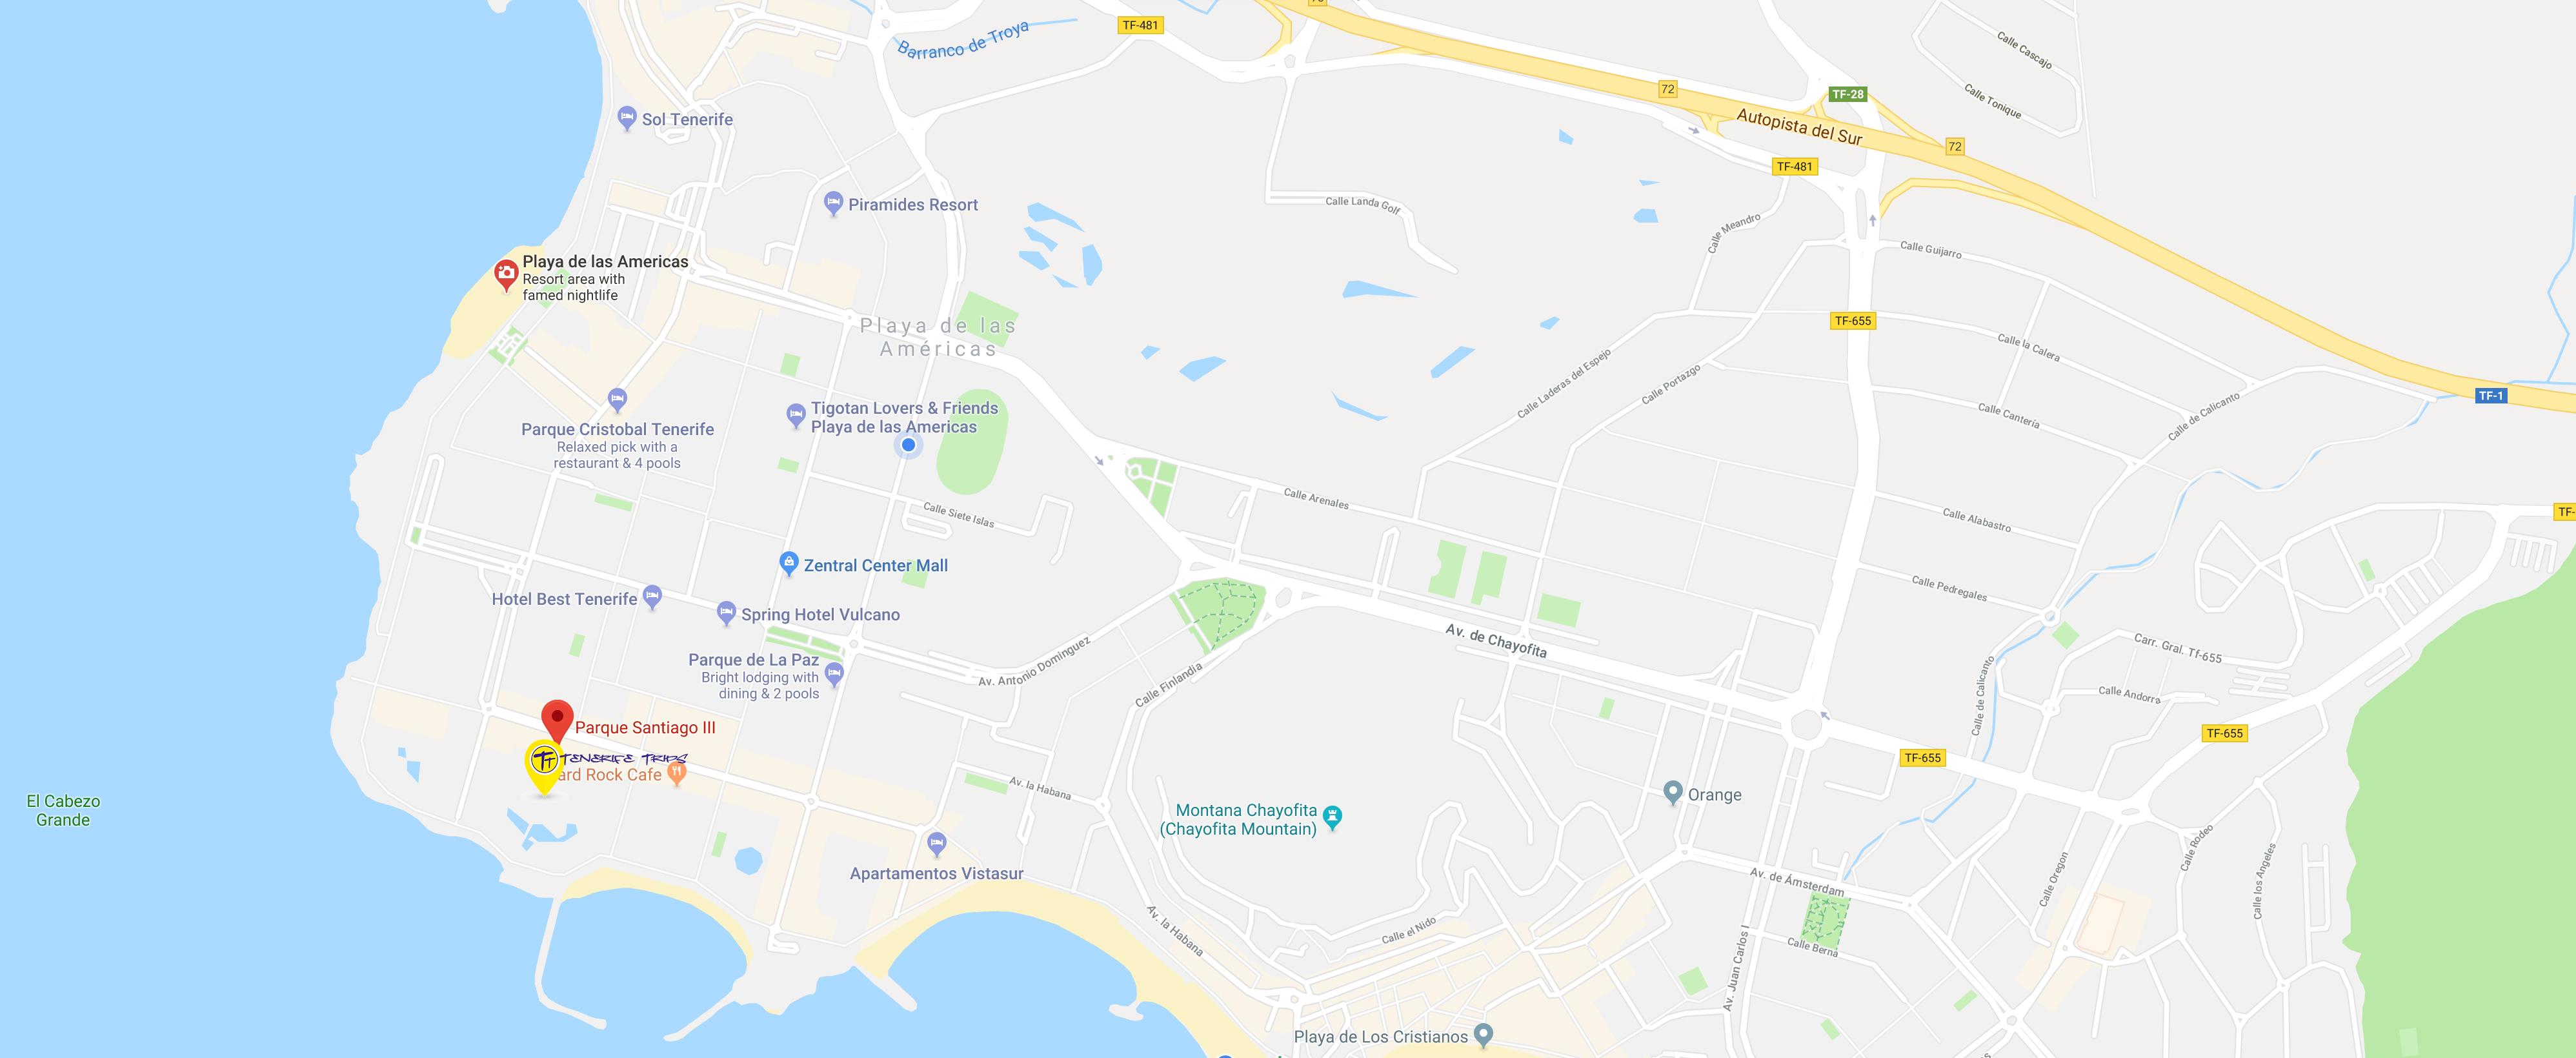 Tenerife Trips Google Map